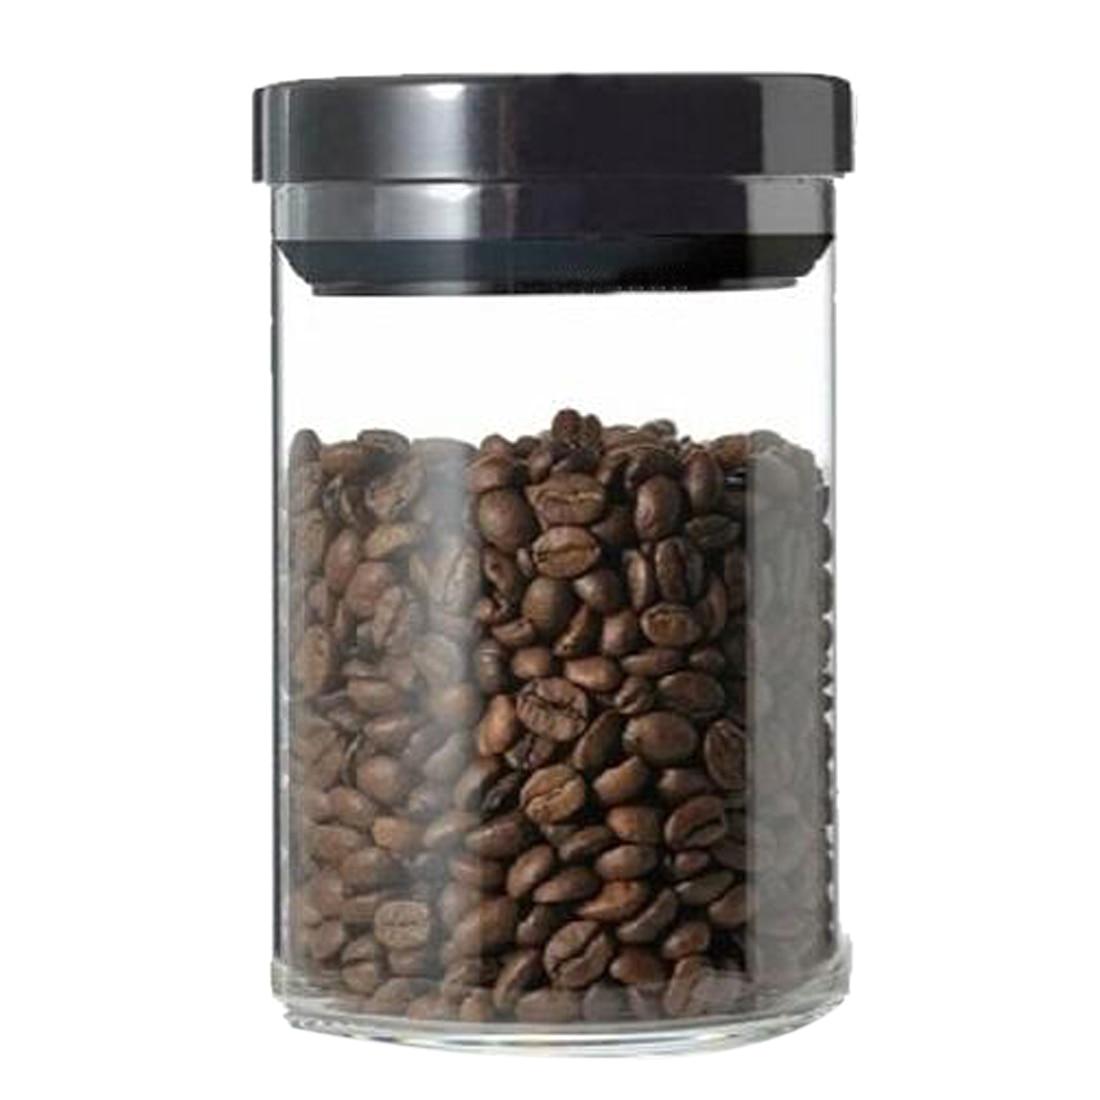 New Arrival 900mL Transparent Glass Store Vacuum Can Tea Coffee Bean Milk Powder Kitchen Storage Jar with Lid